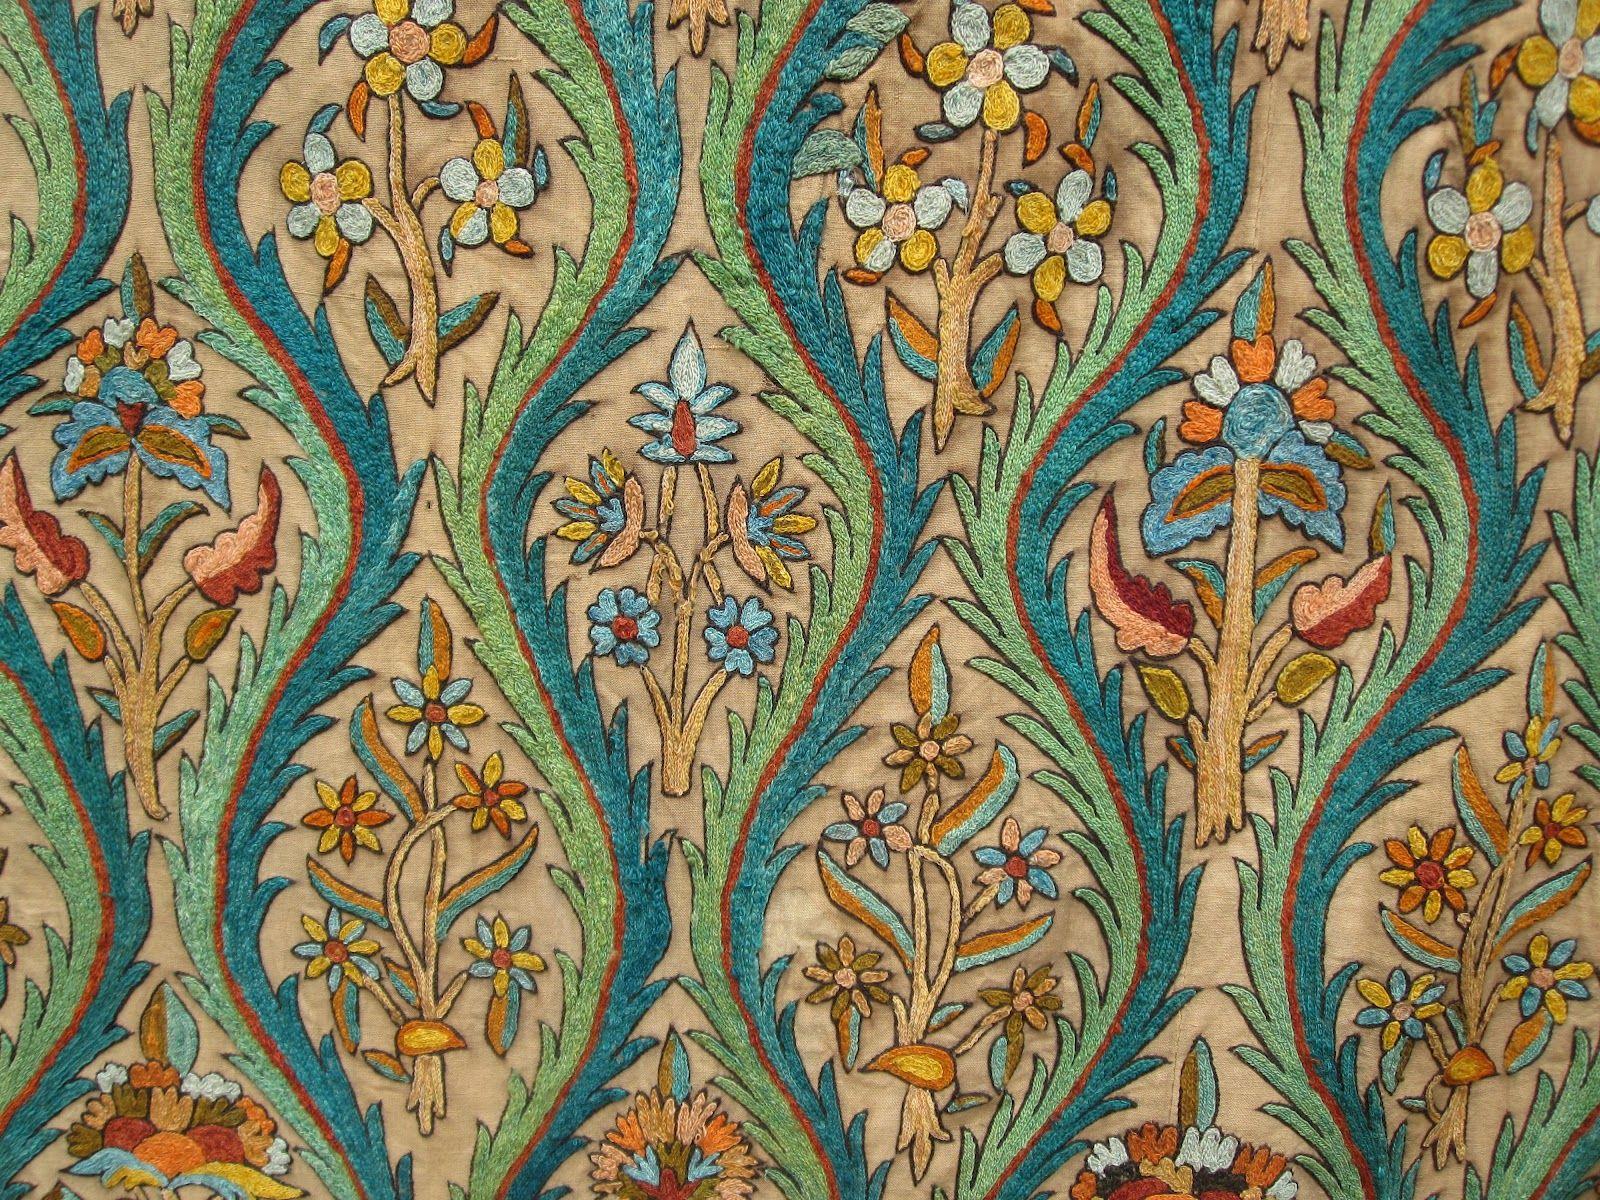 English Arts And Crafts Movement William Morris